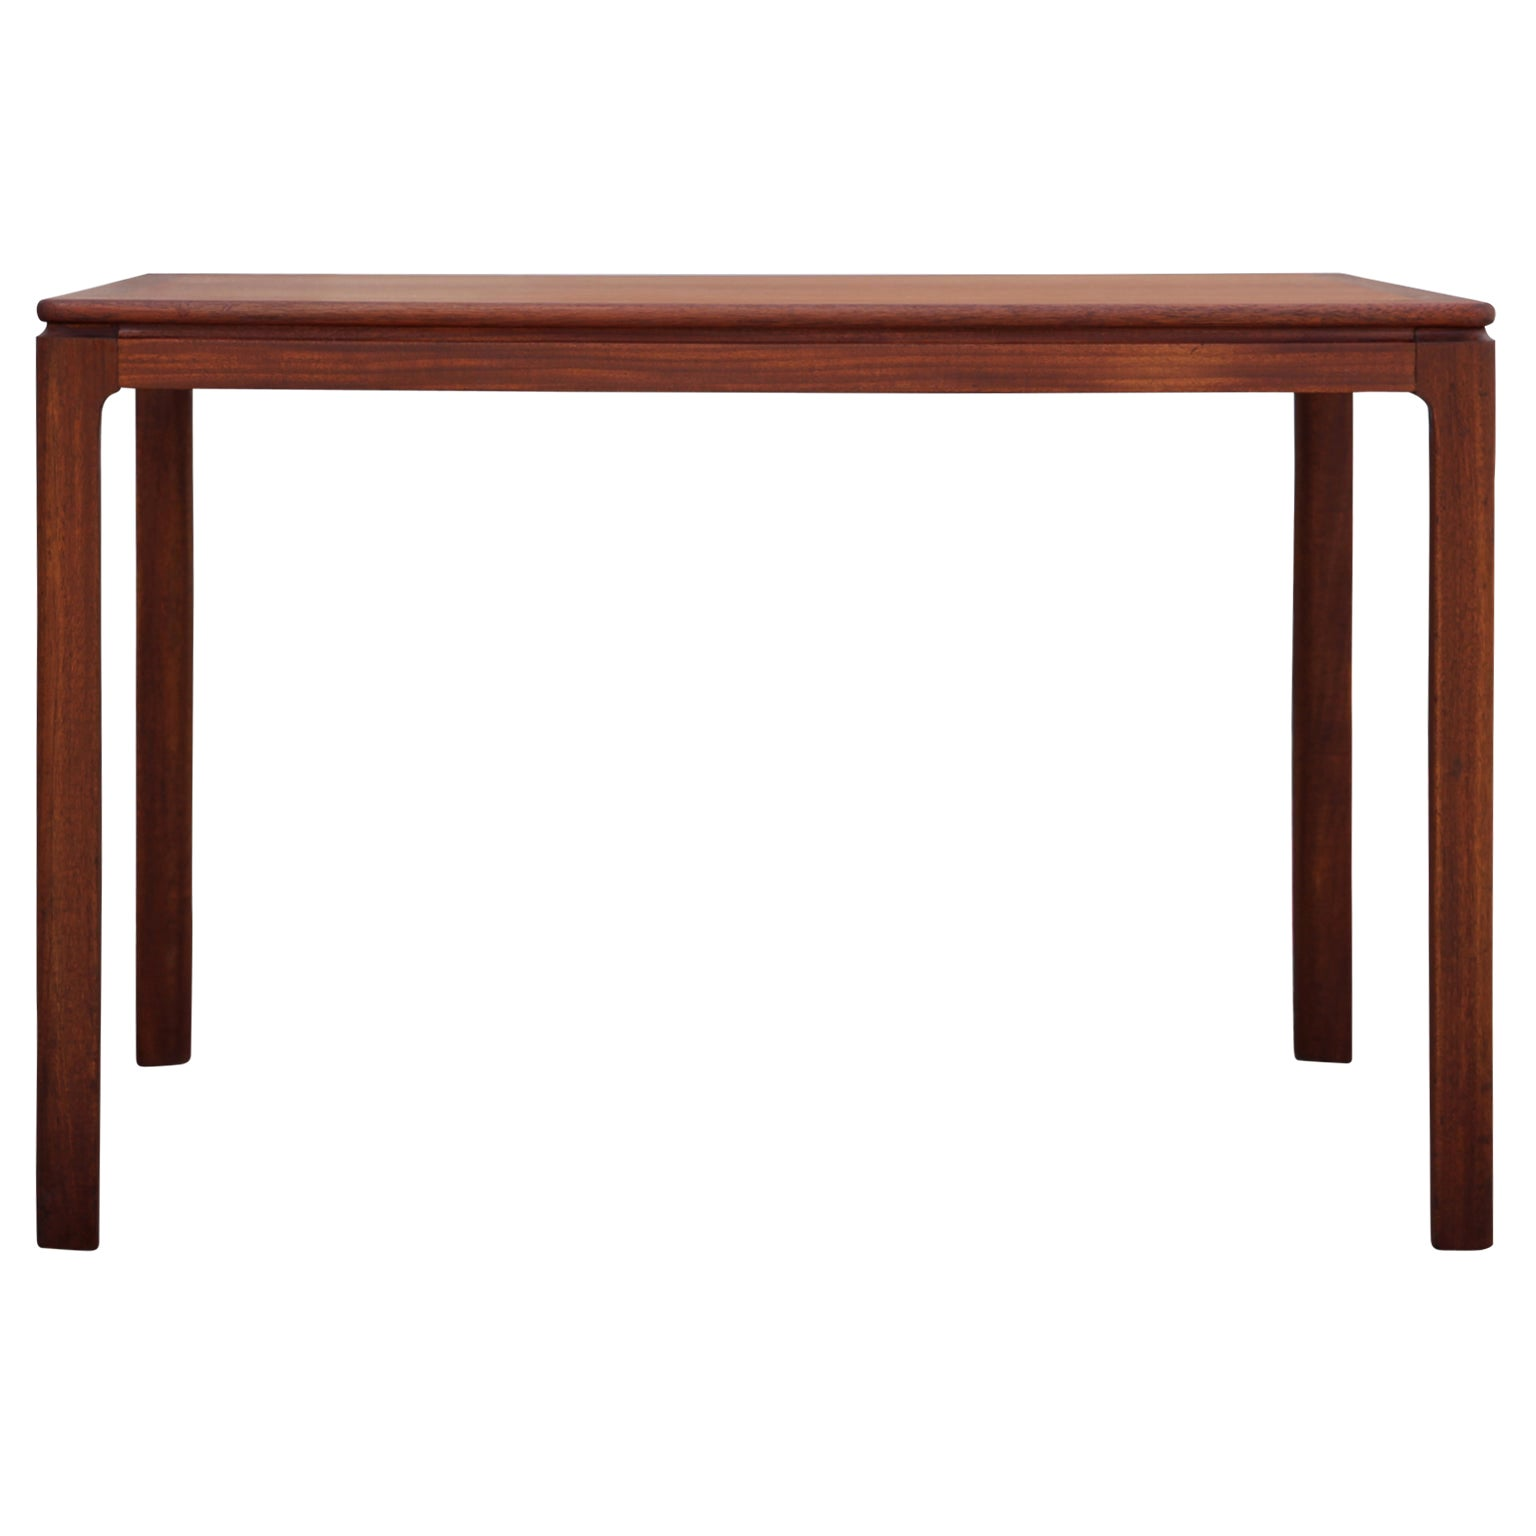 Danish Mid-Century Modern Teak Rectangular Side Table